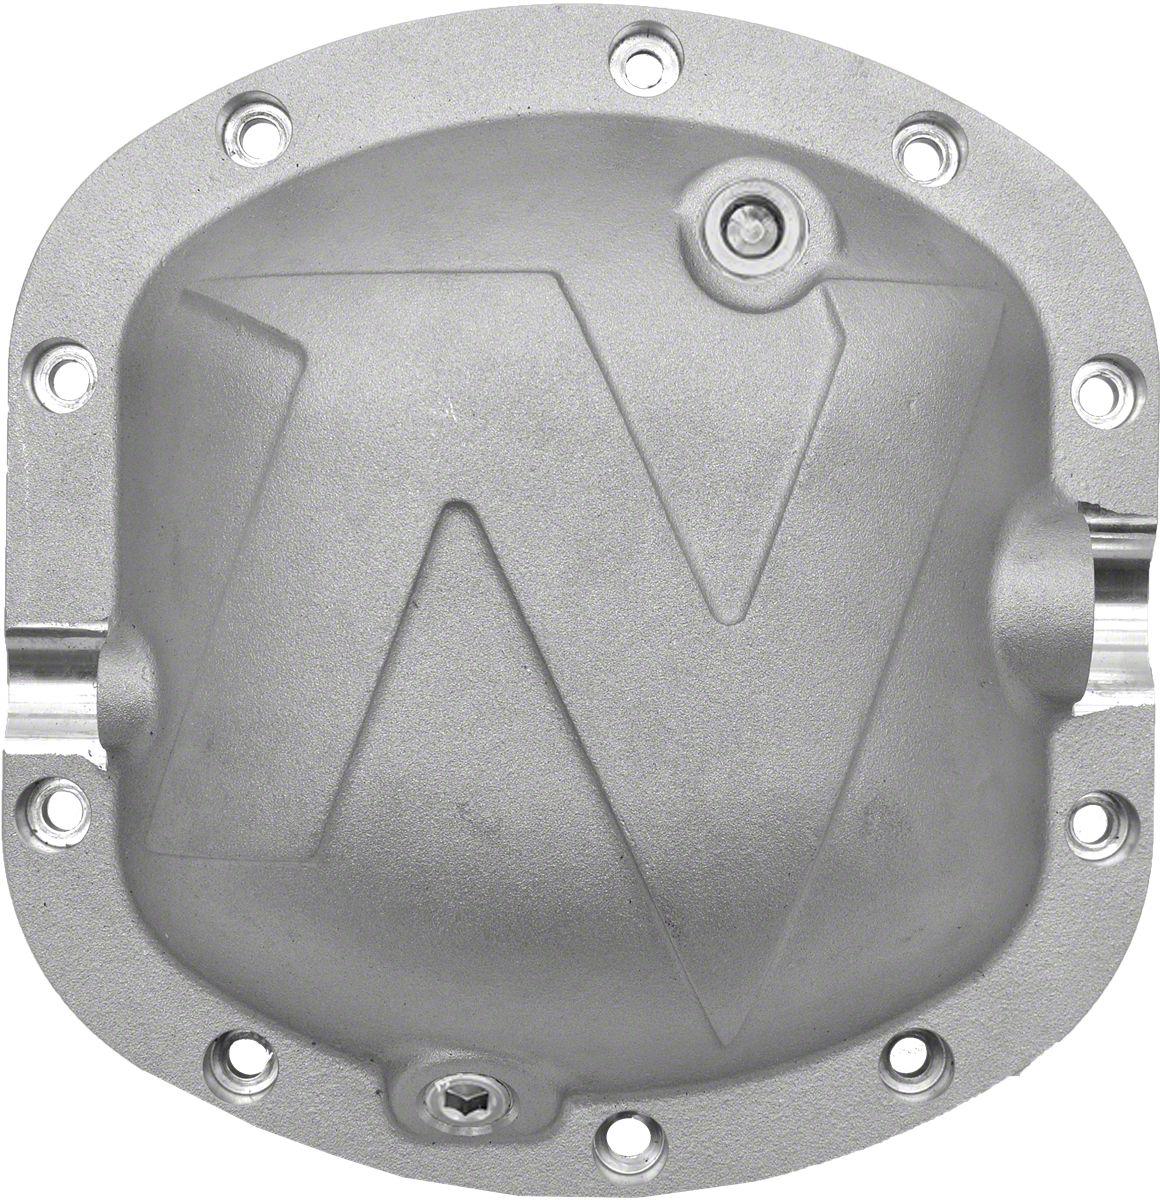 Nitro Gear & Axle X-Treme Dana 30 Differential Cover (87-18 Jeep Wrangler YJ, TJ & JK)